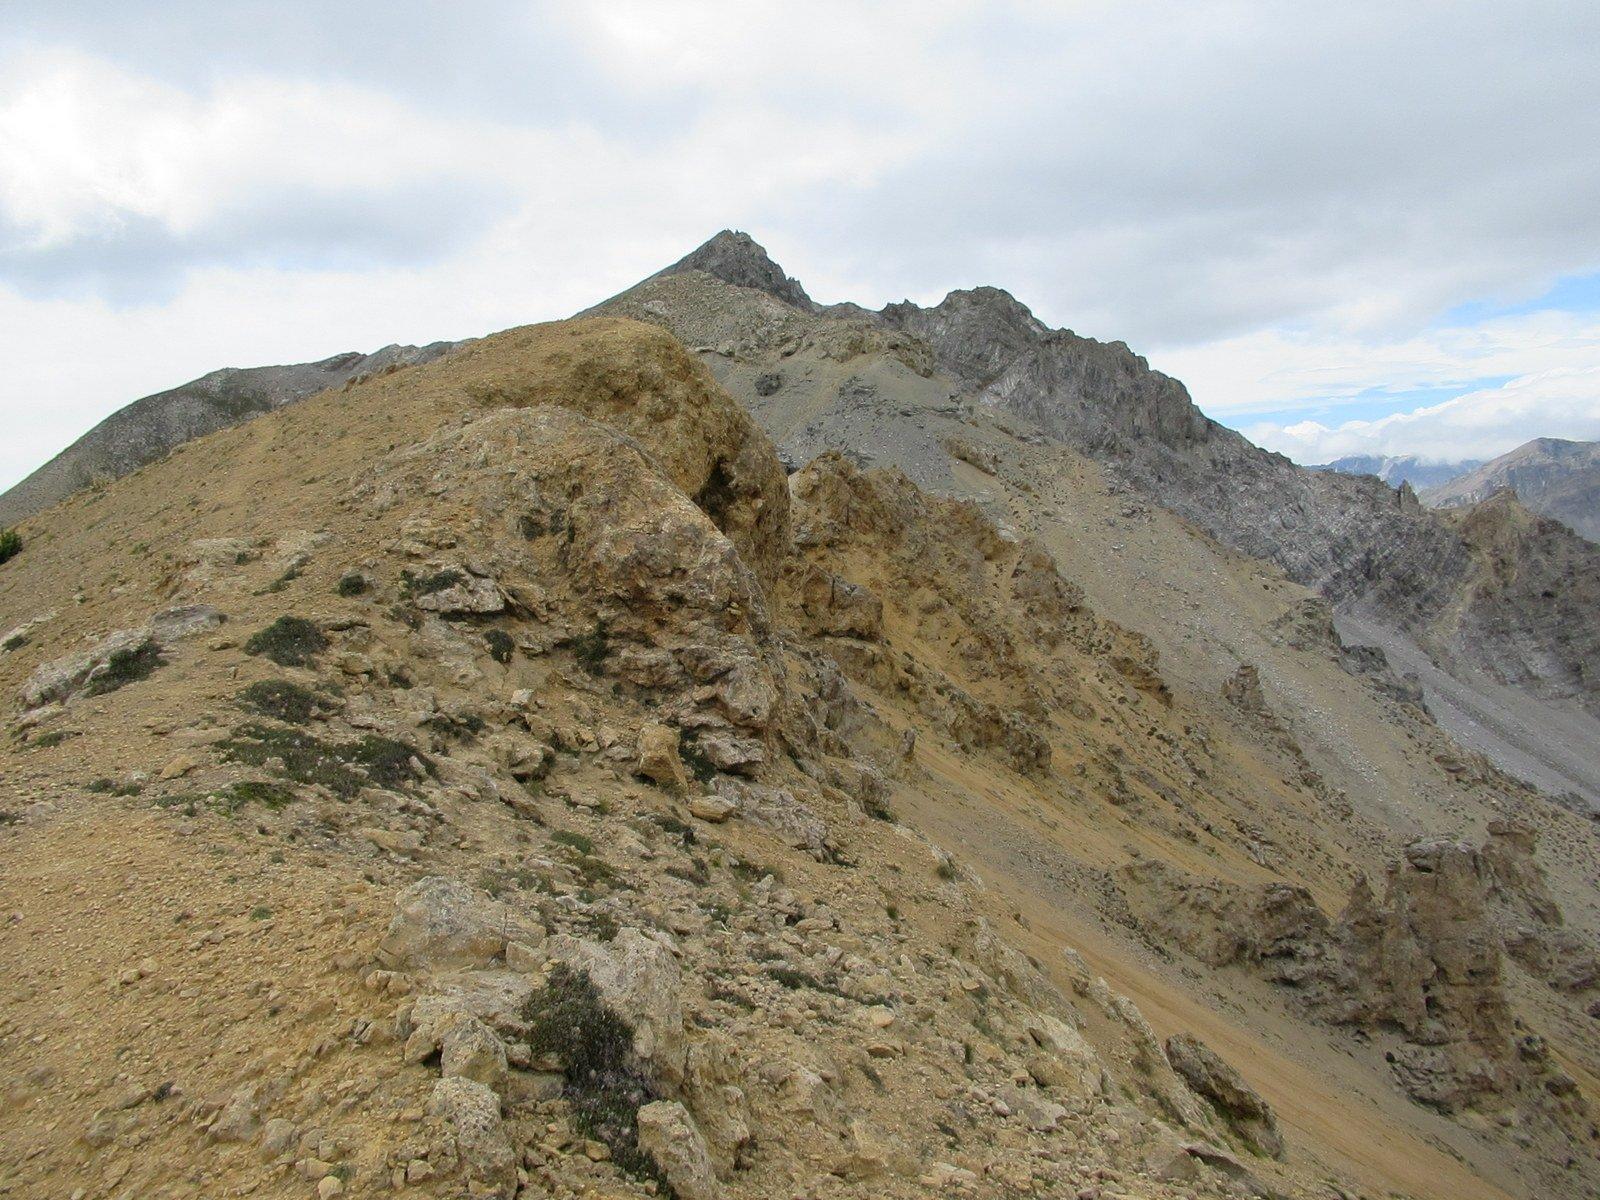 La Sueur vista dai pressi del Pas des Rousses